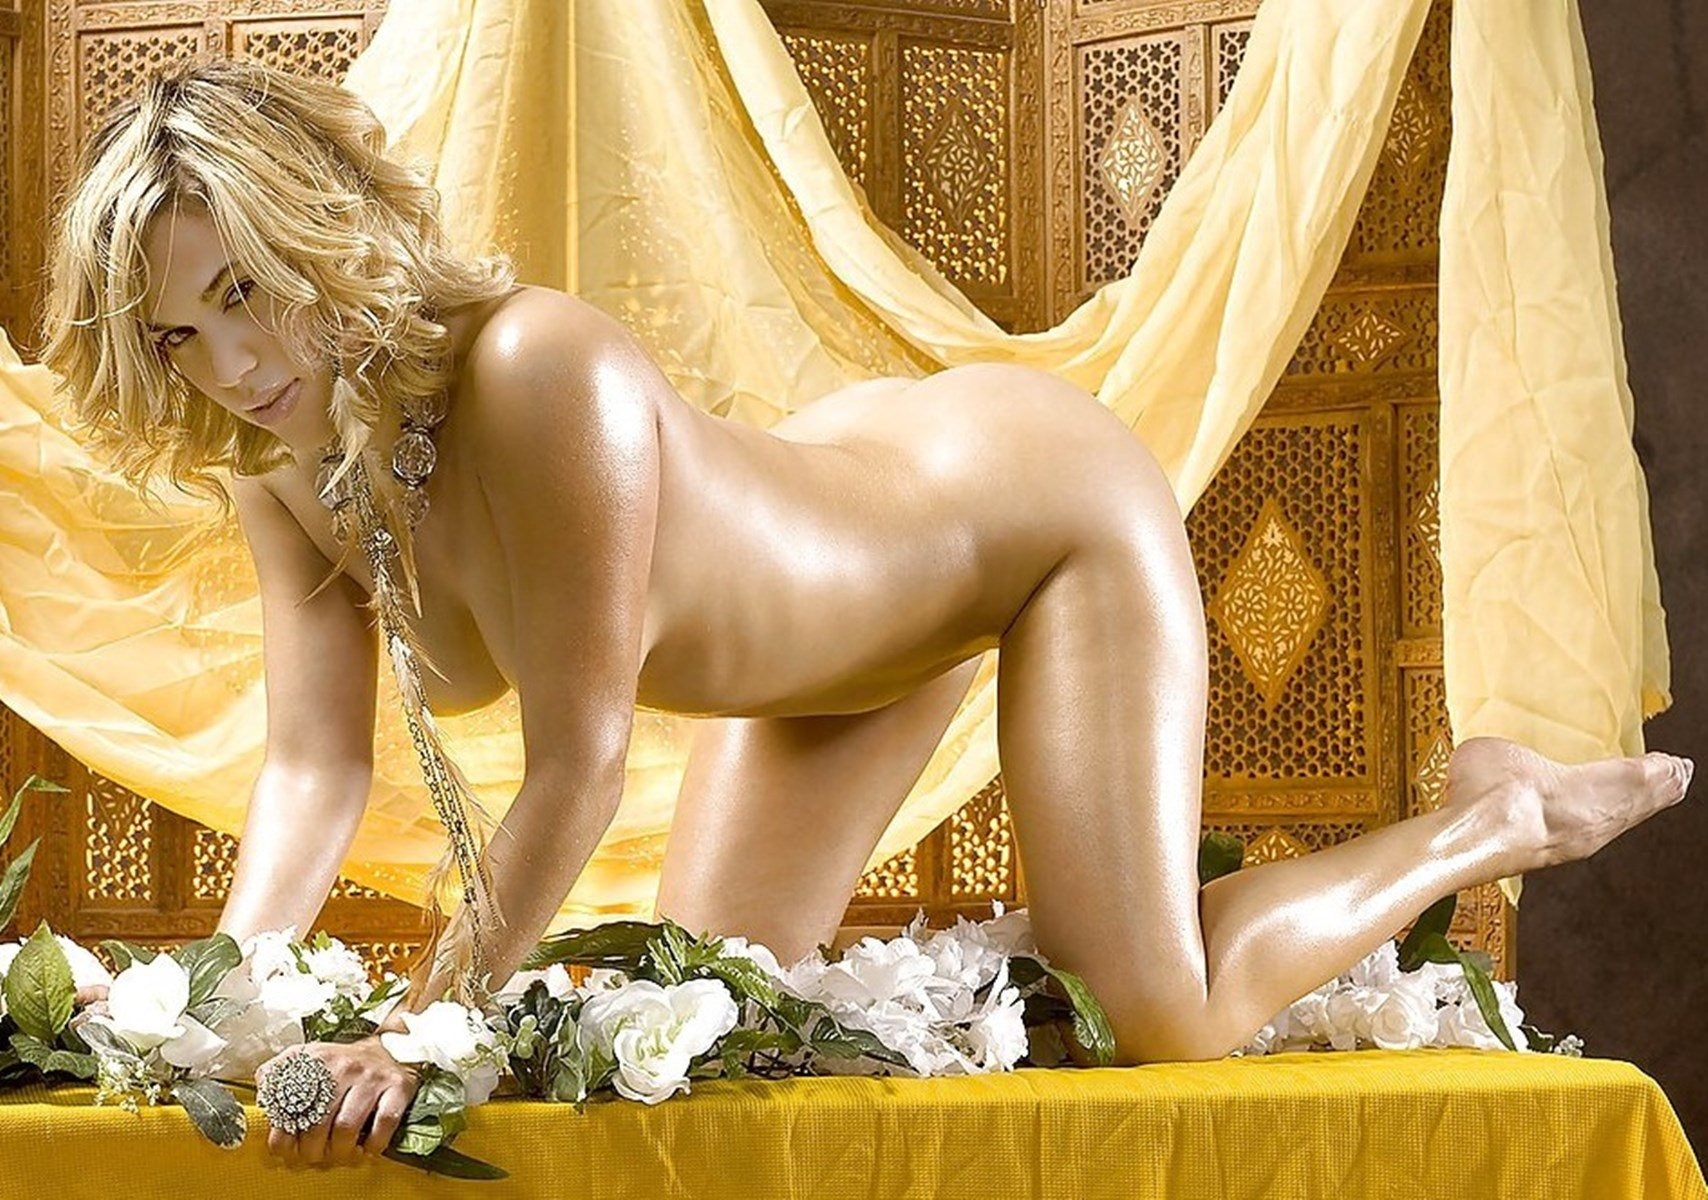 Free Hot Wwe Divas Nude